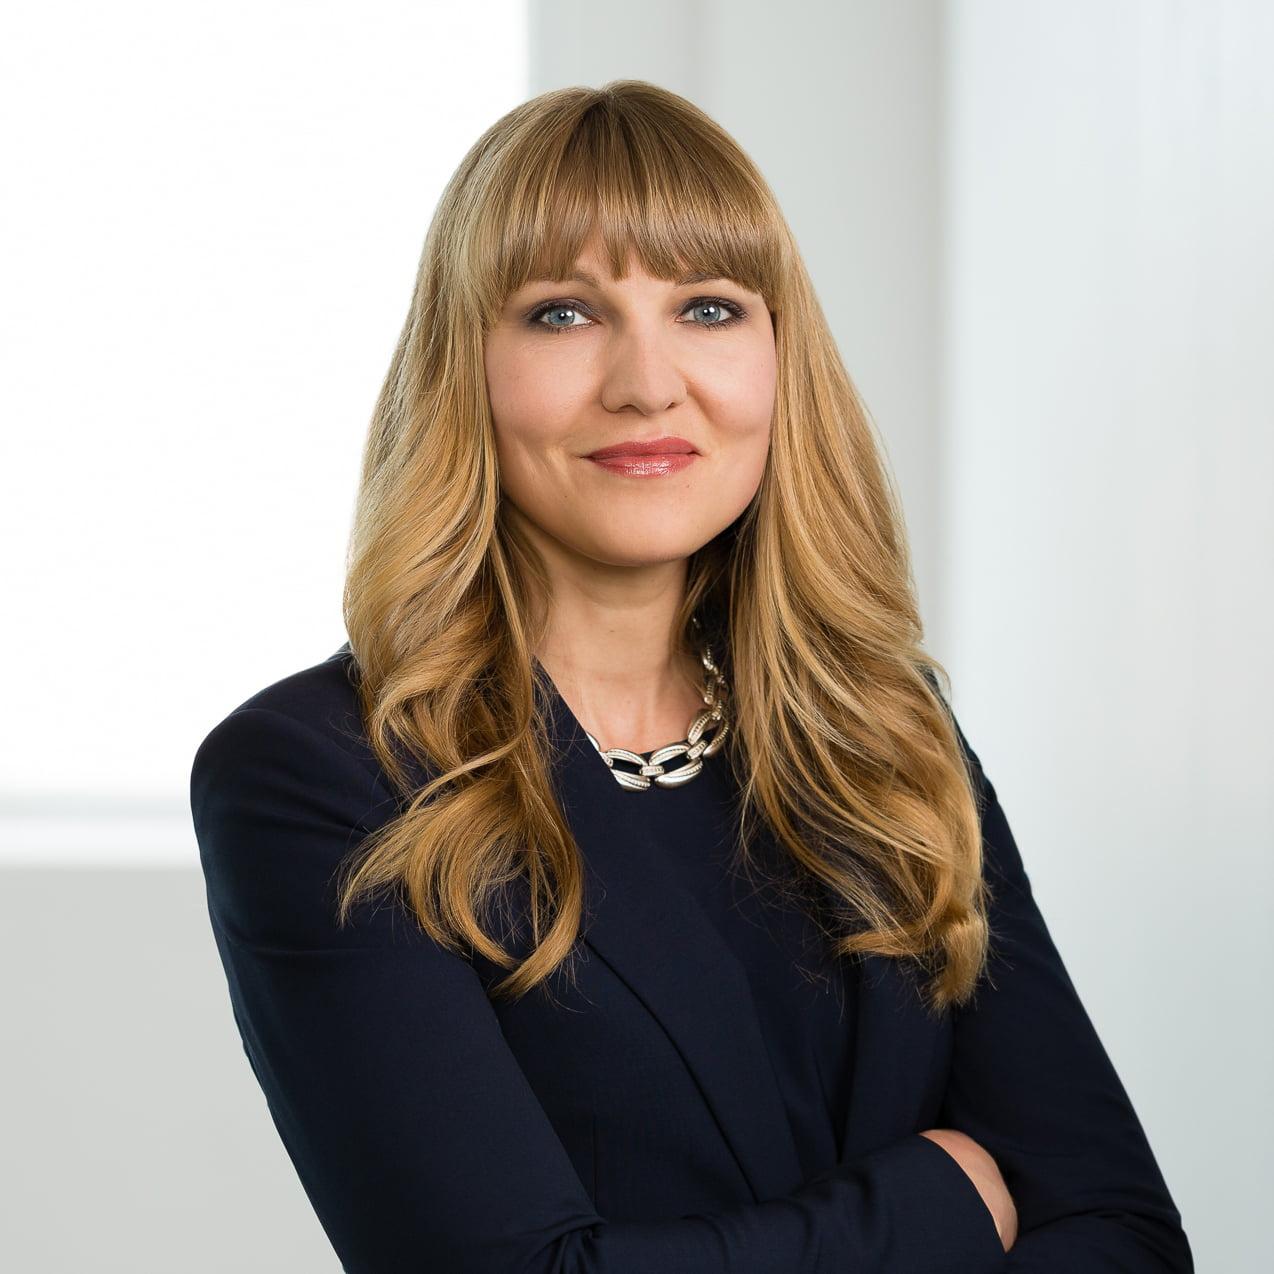 Julia Ryckman